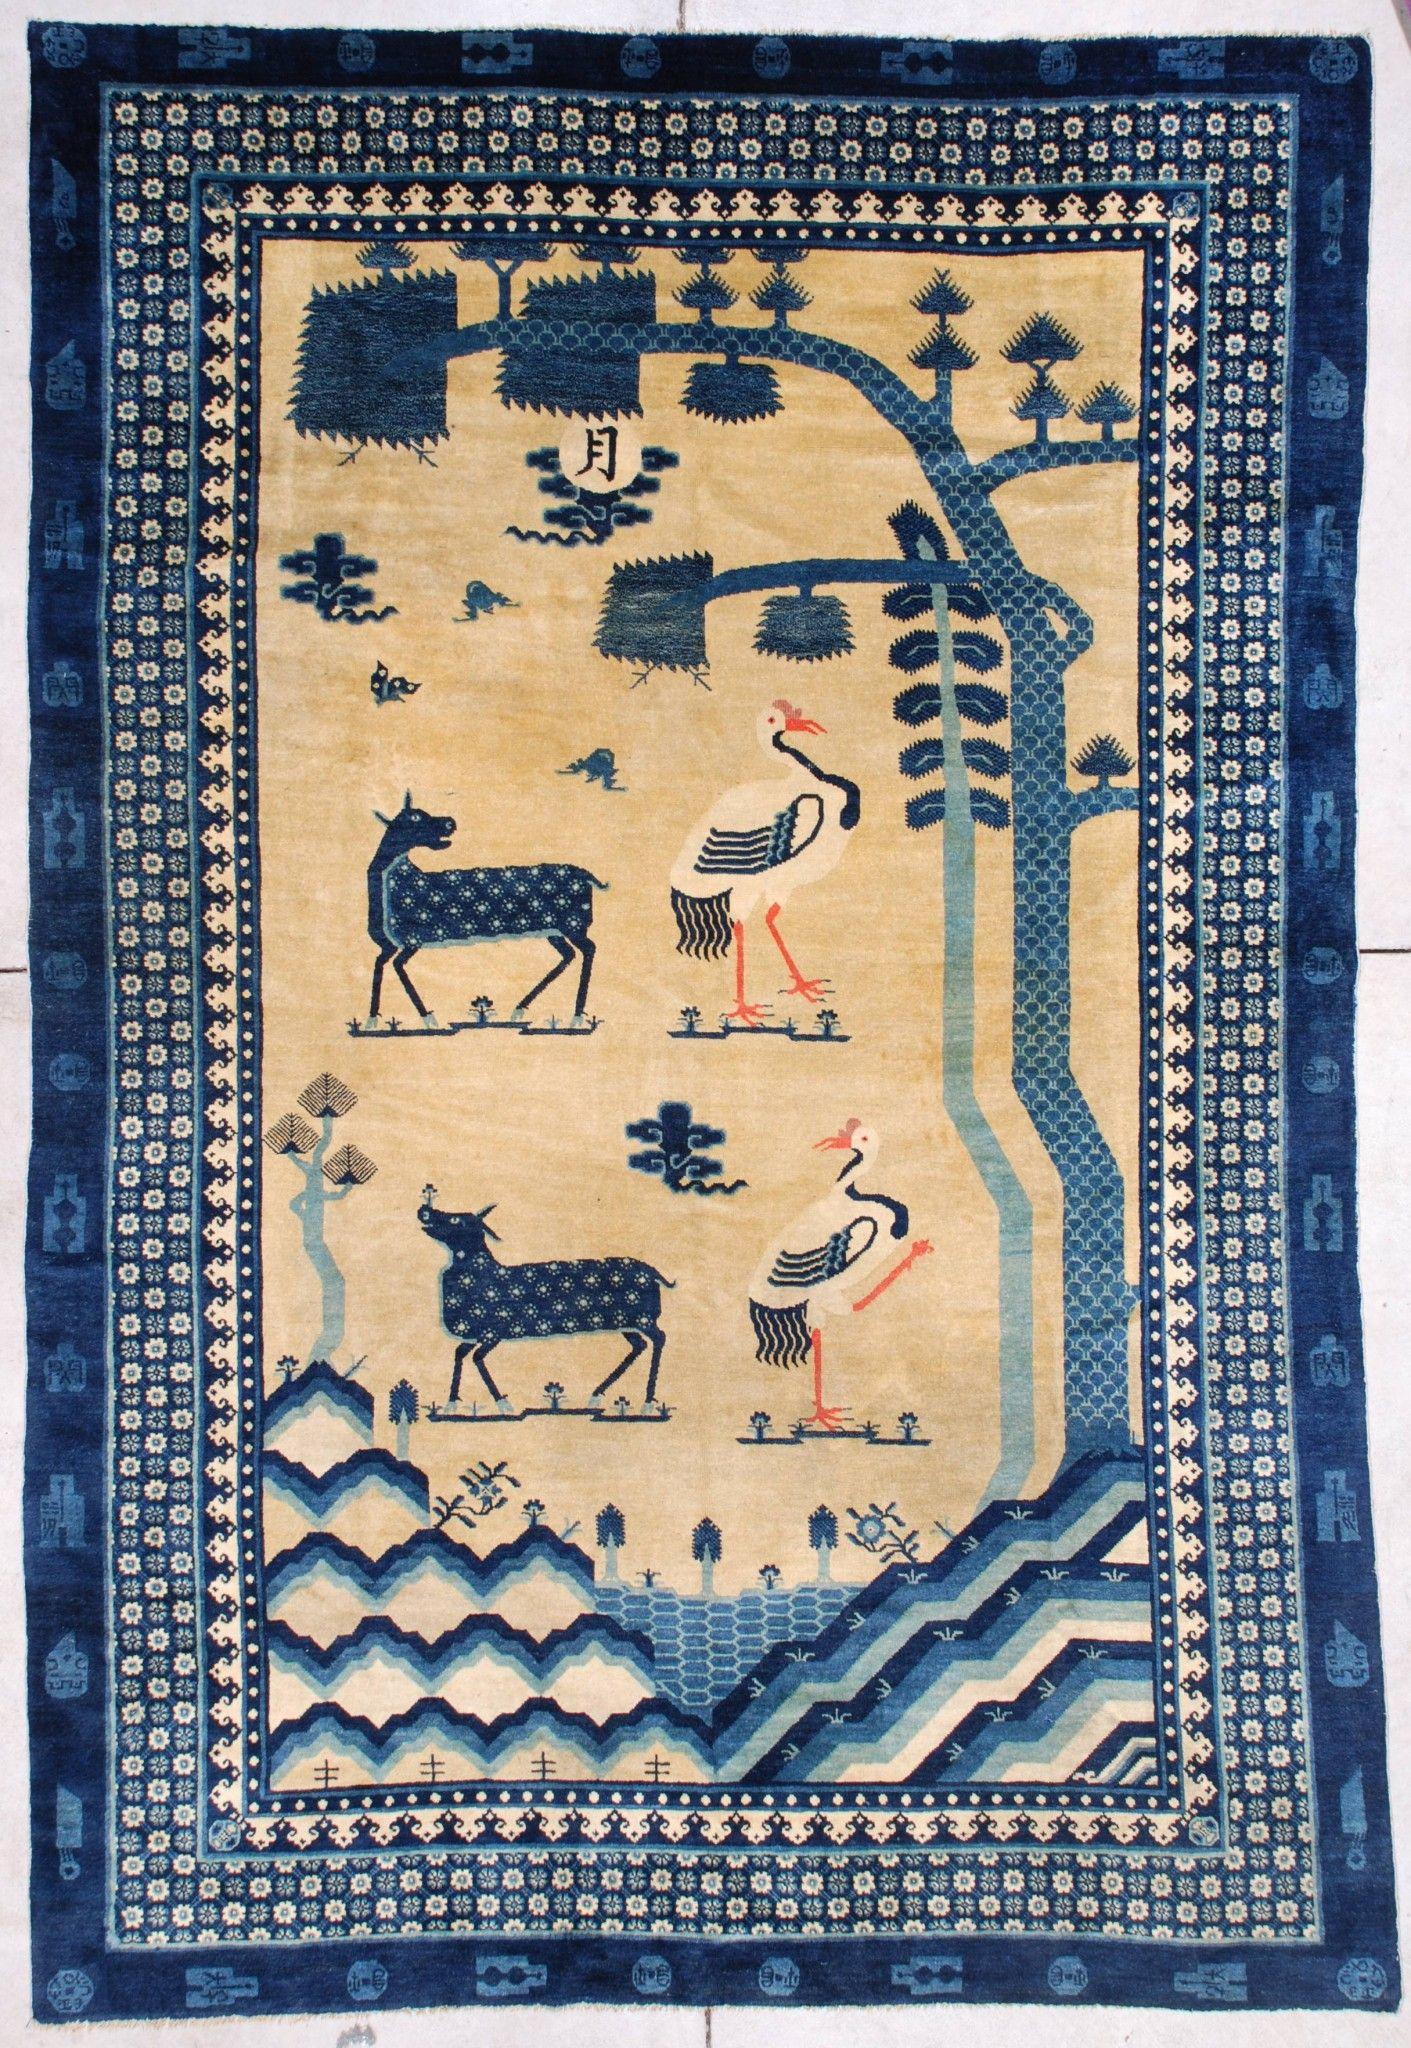 7261 Antique Mongolian Rug 6 5 X 9 4 Antique Oriental Rugs Antique Oriental Rugs Art Deco Rugs Rugs